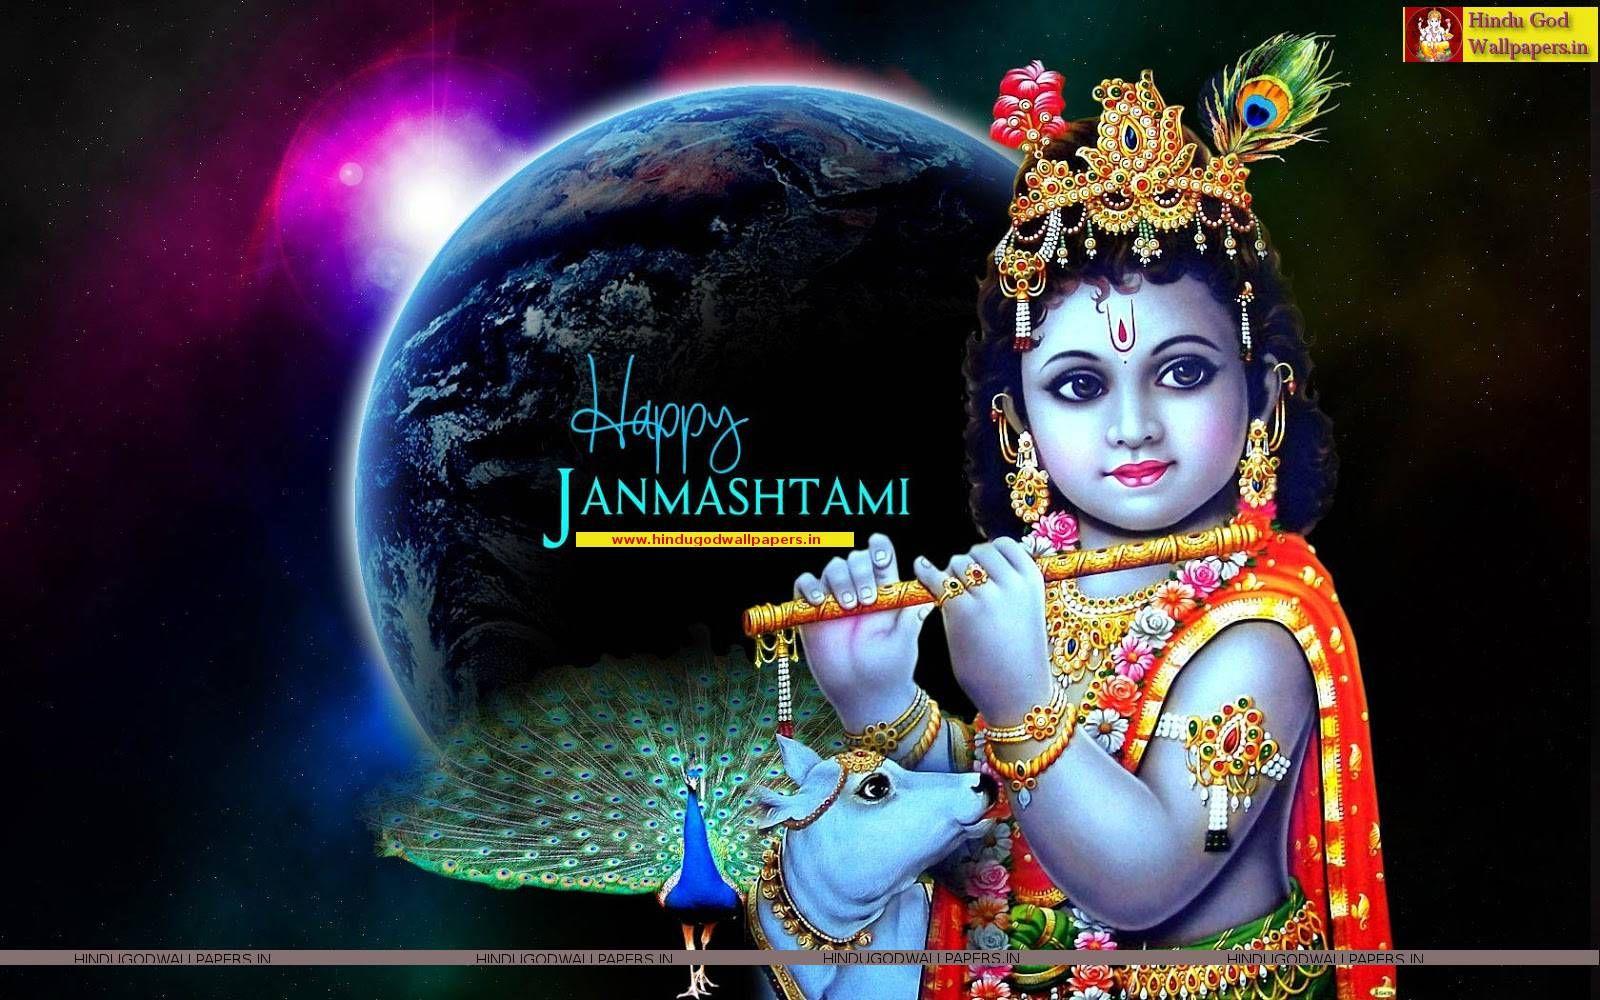 Happy Krishna Janmashtami Gif - HD Wallpaper